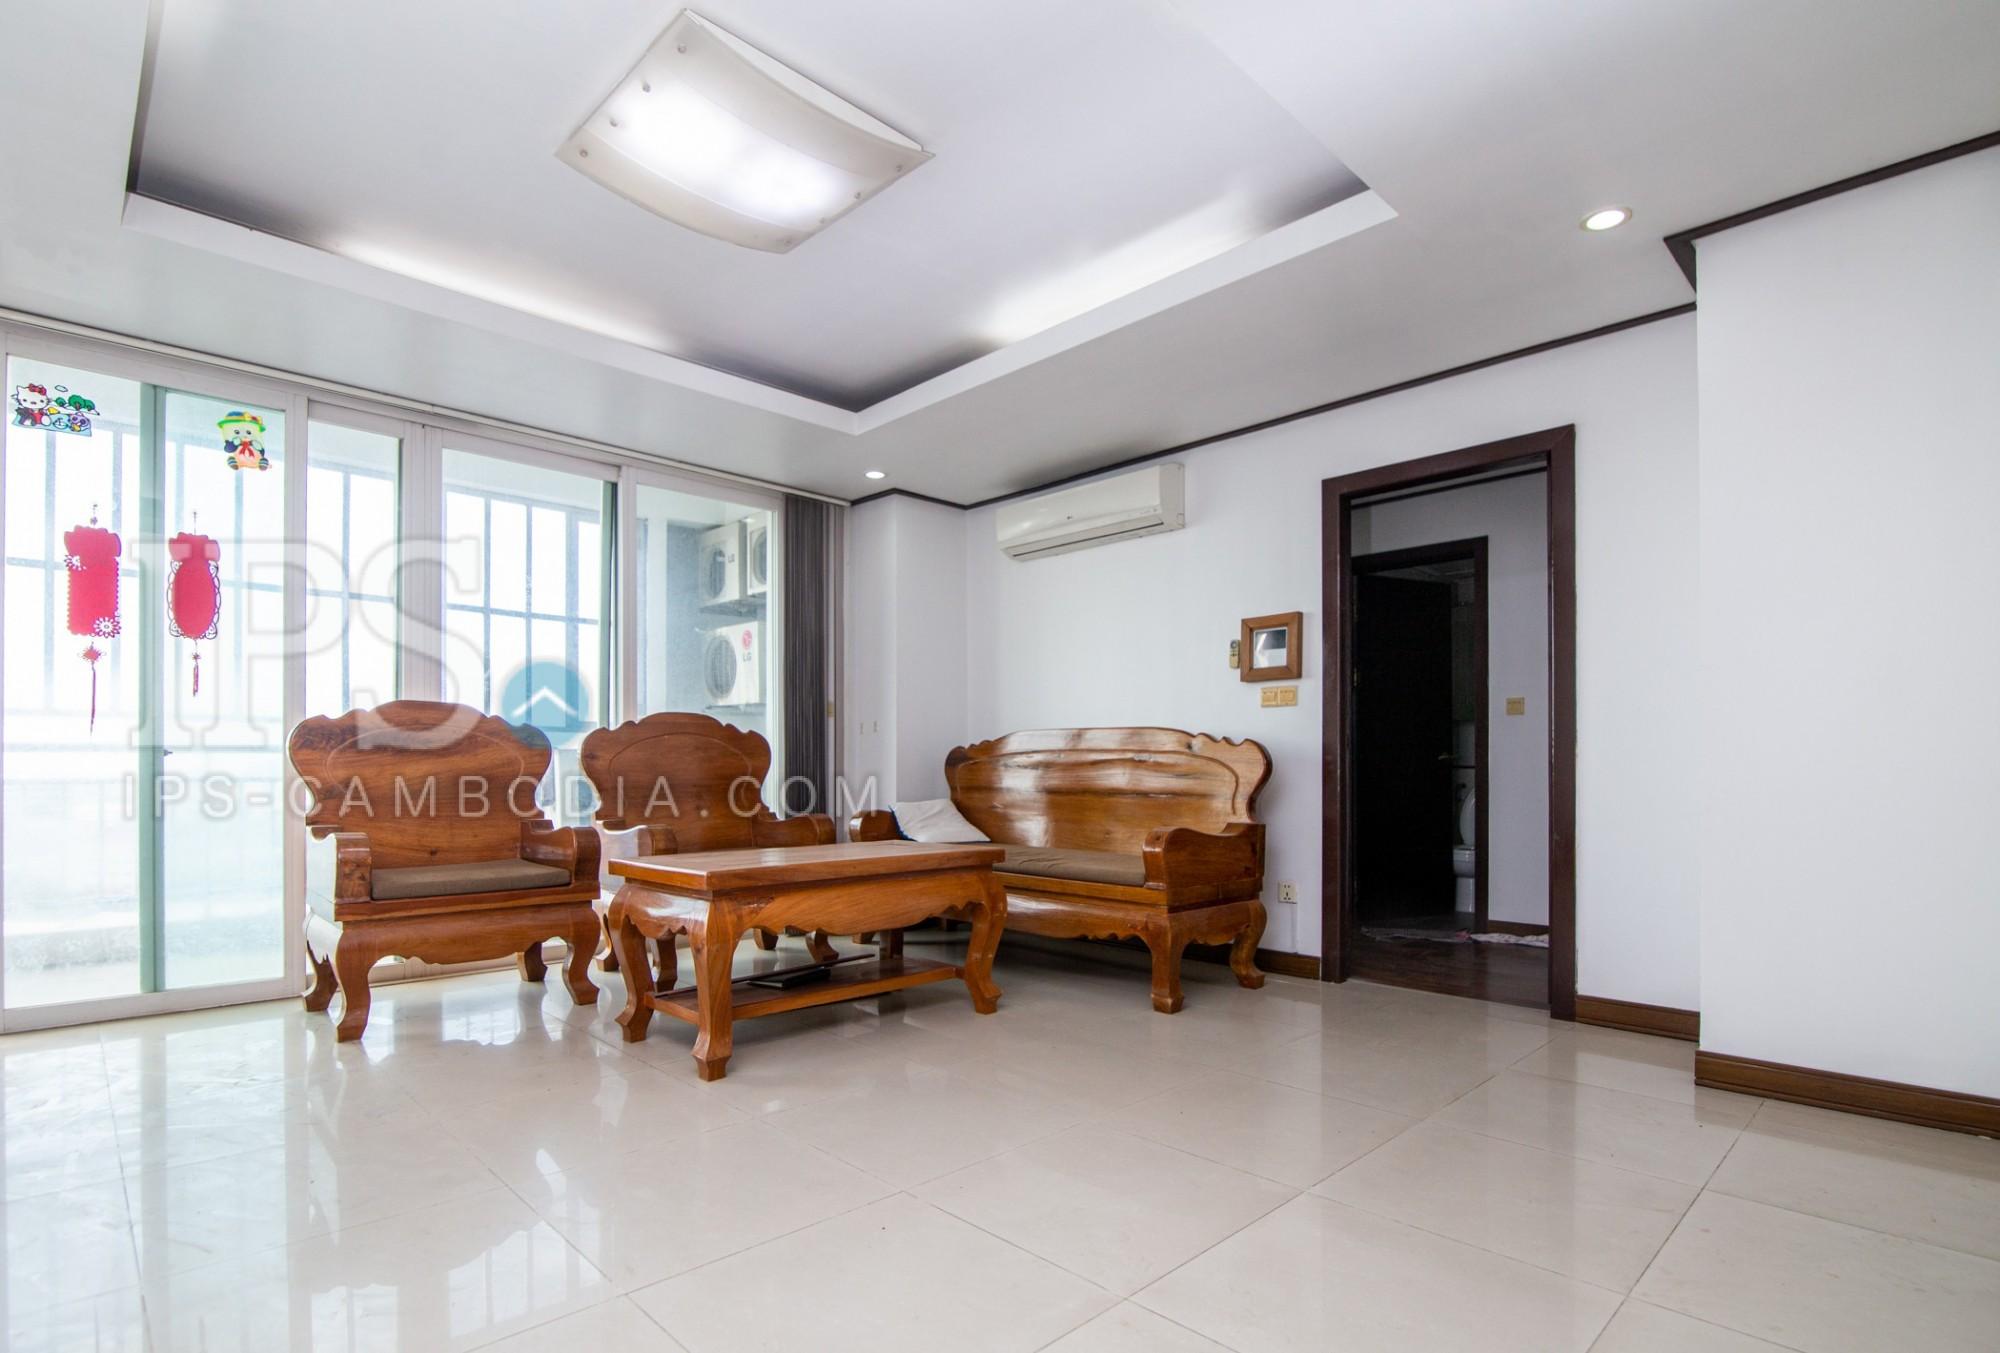 4 Bedroom Apartment For Sale - Toul Kork, Phnom Penh